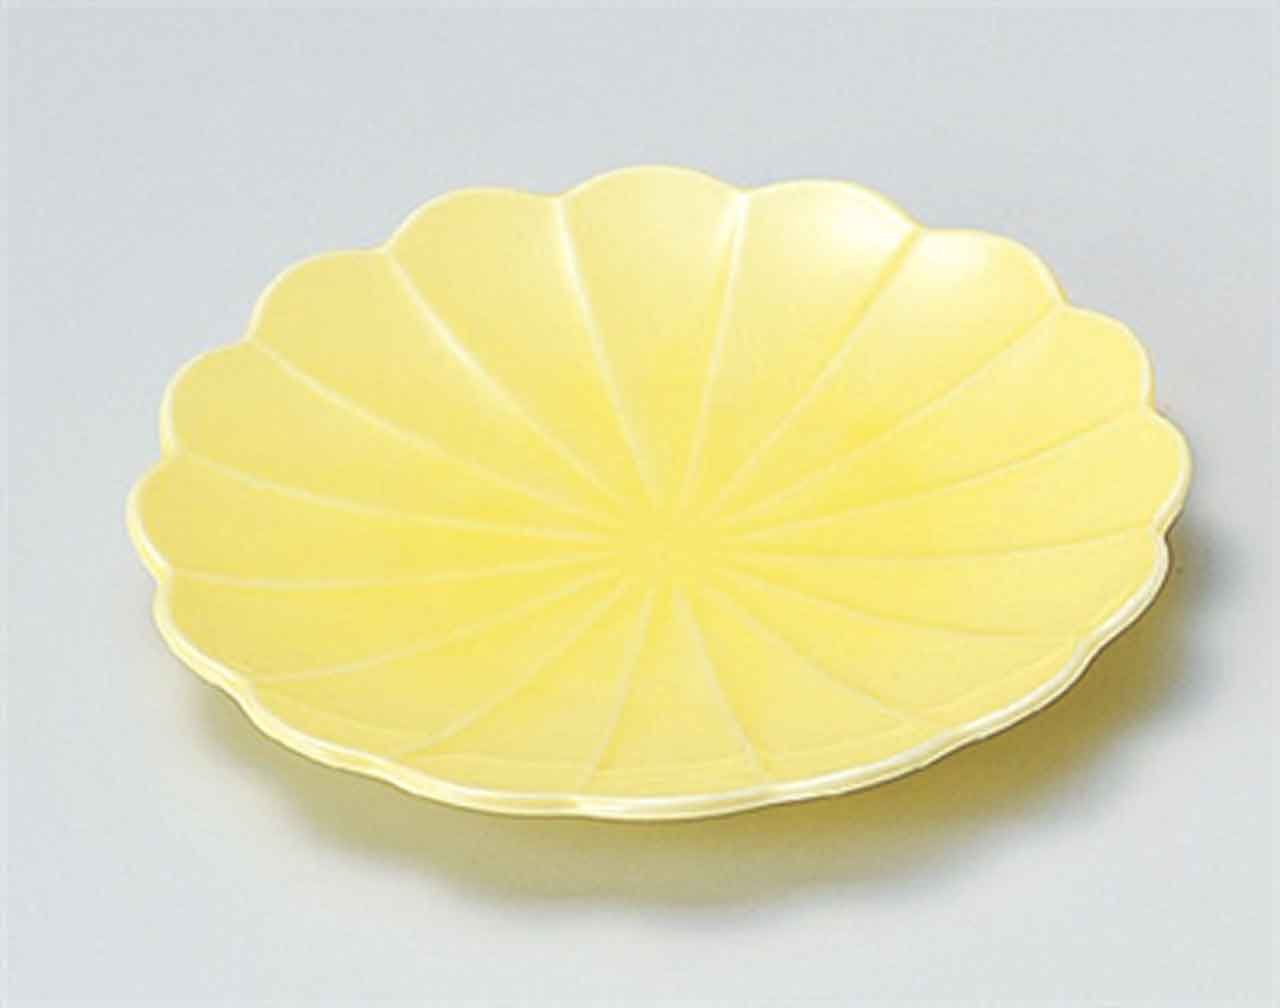 Kotohana Fukujusou 11.5cm Satz von 5 Mittlerer Tellers porcelain Japanisch traditionell